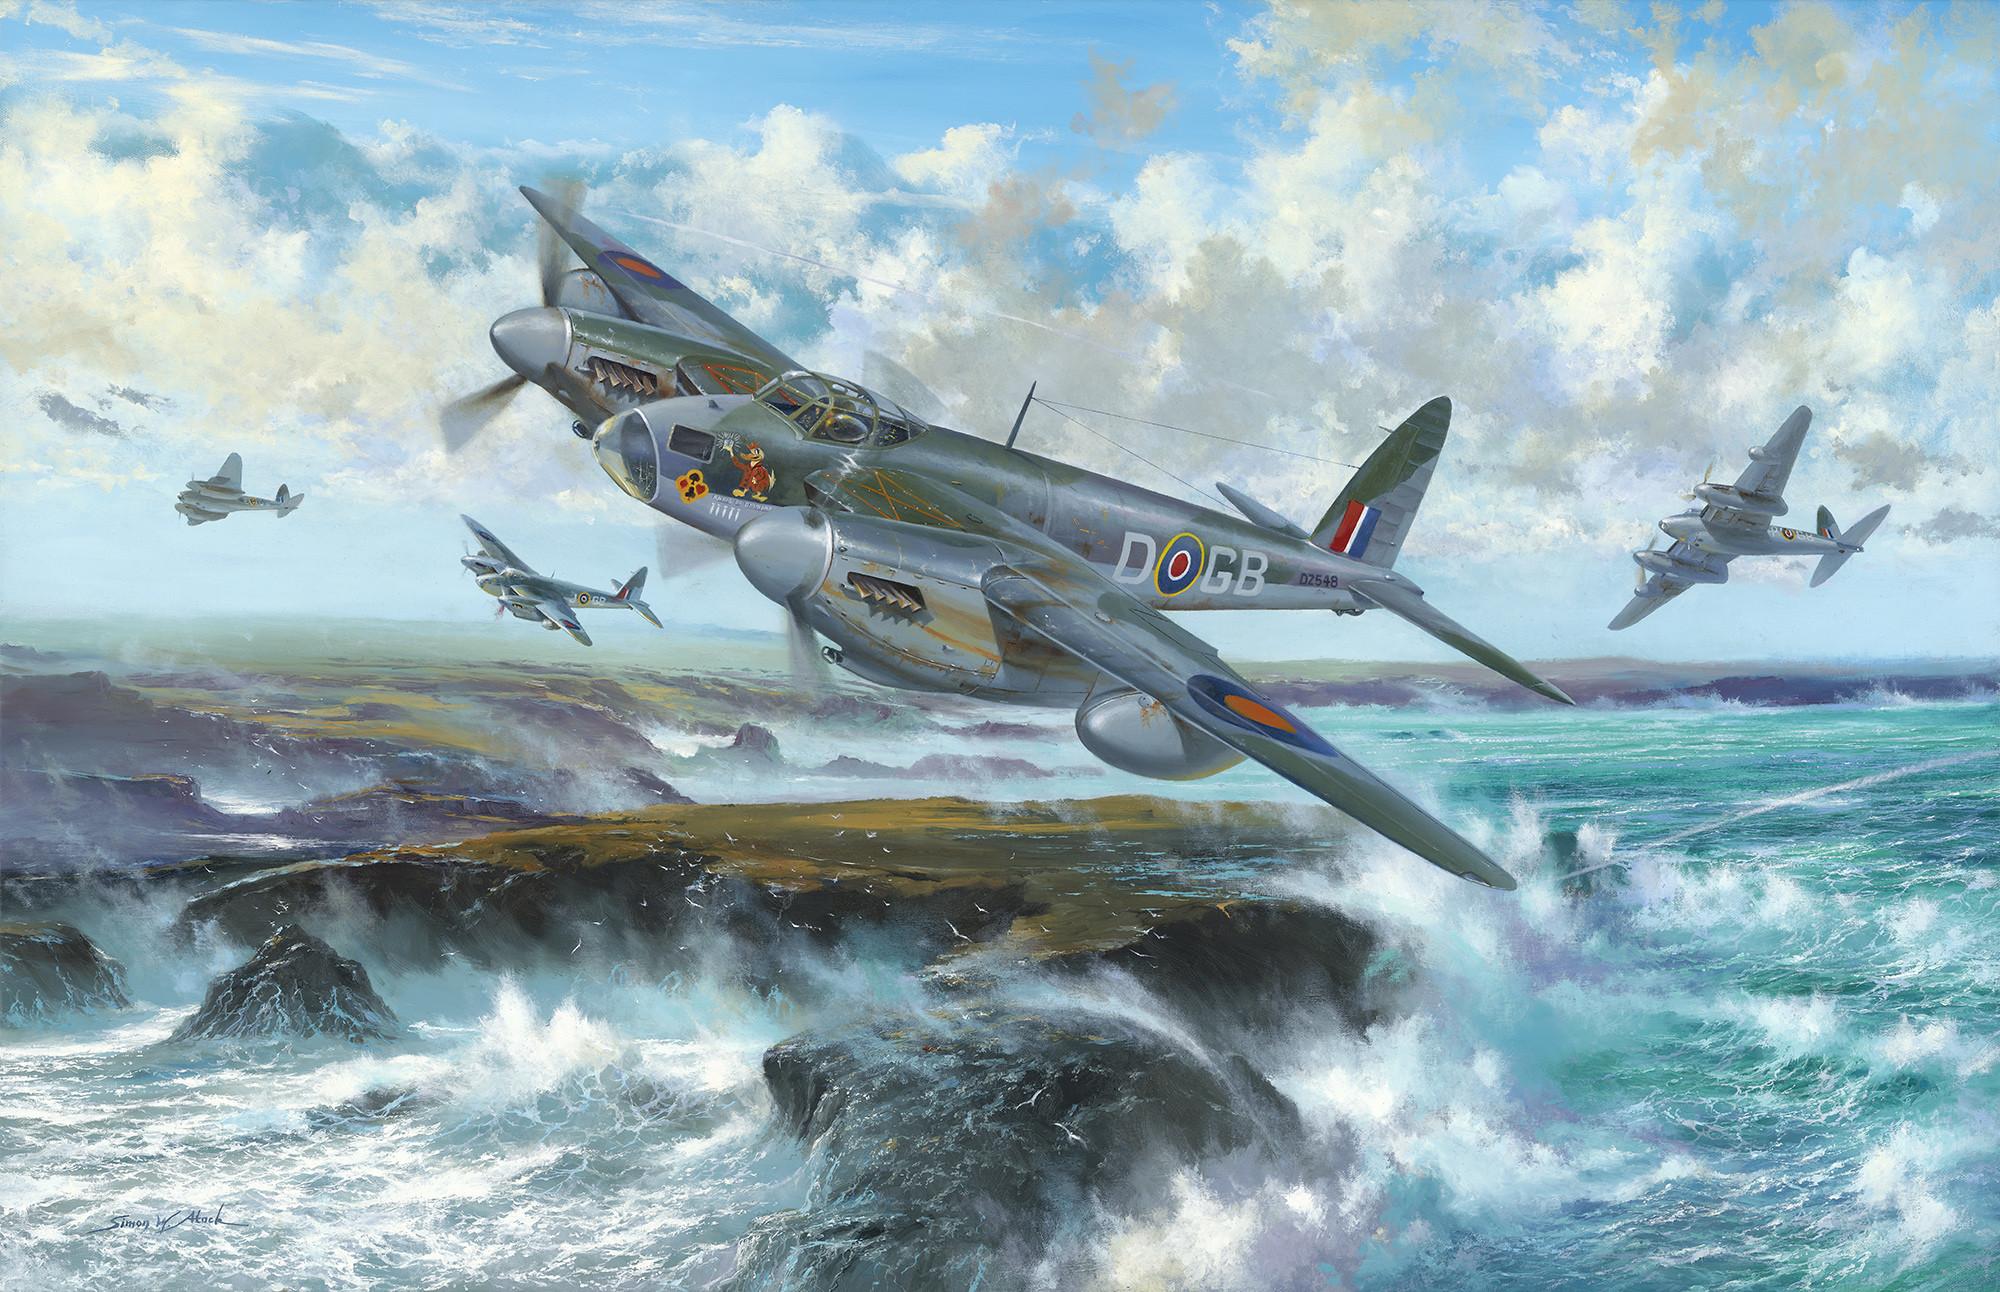 fighter, british aircraft, war, art wallpapers aviation – download .